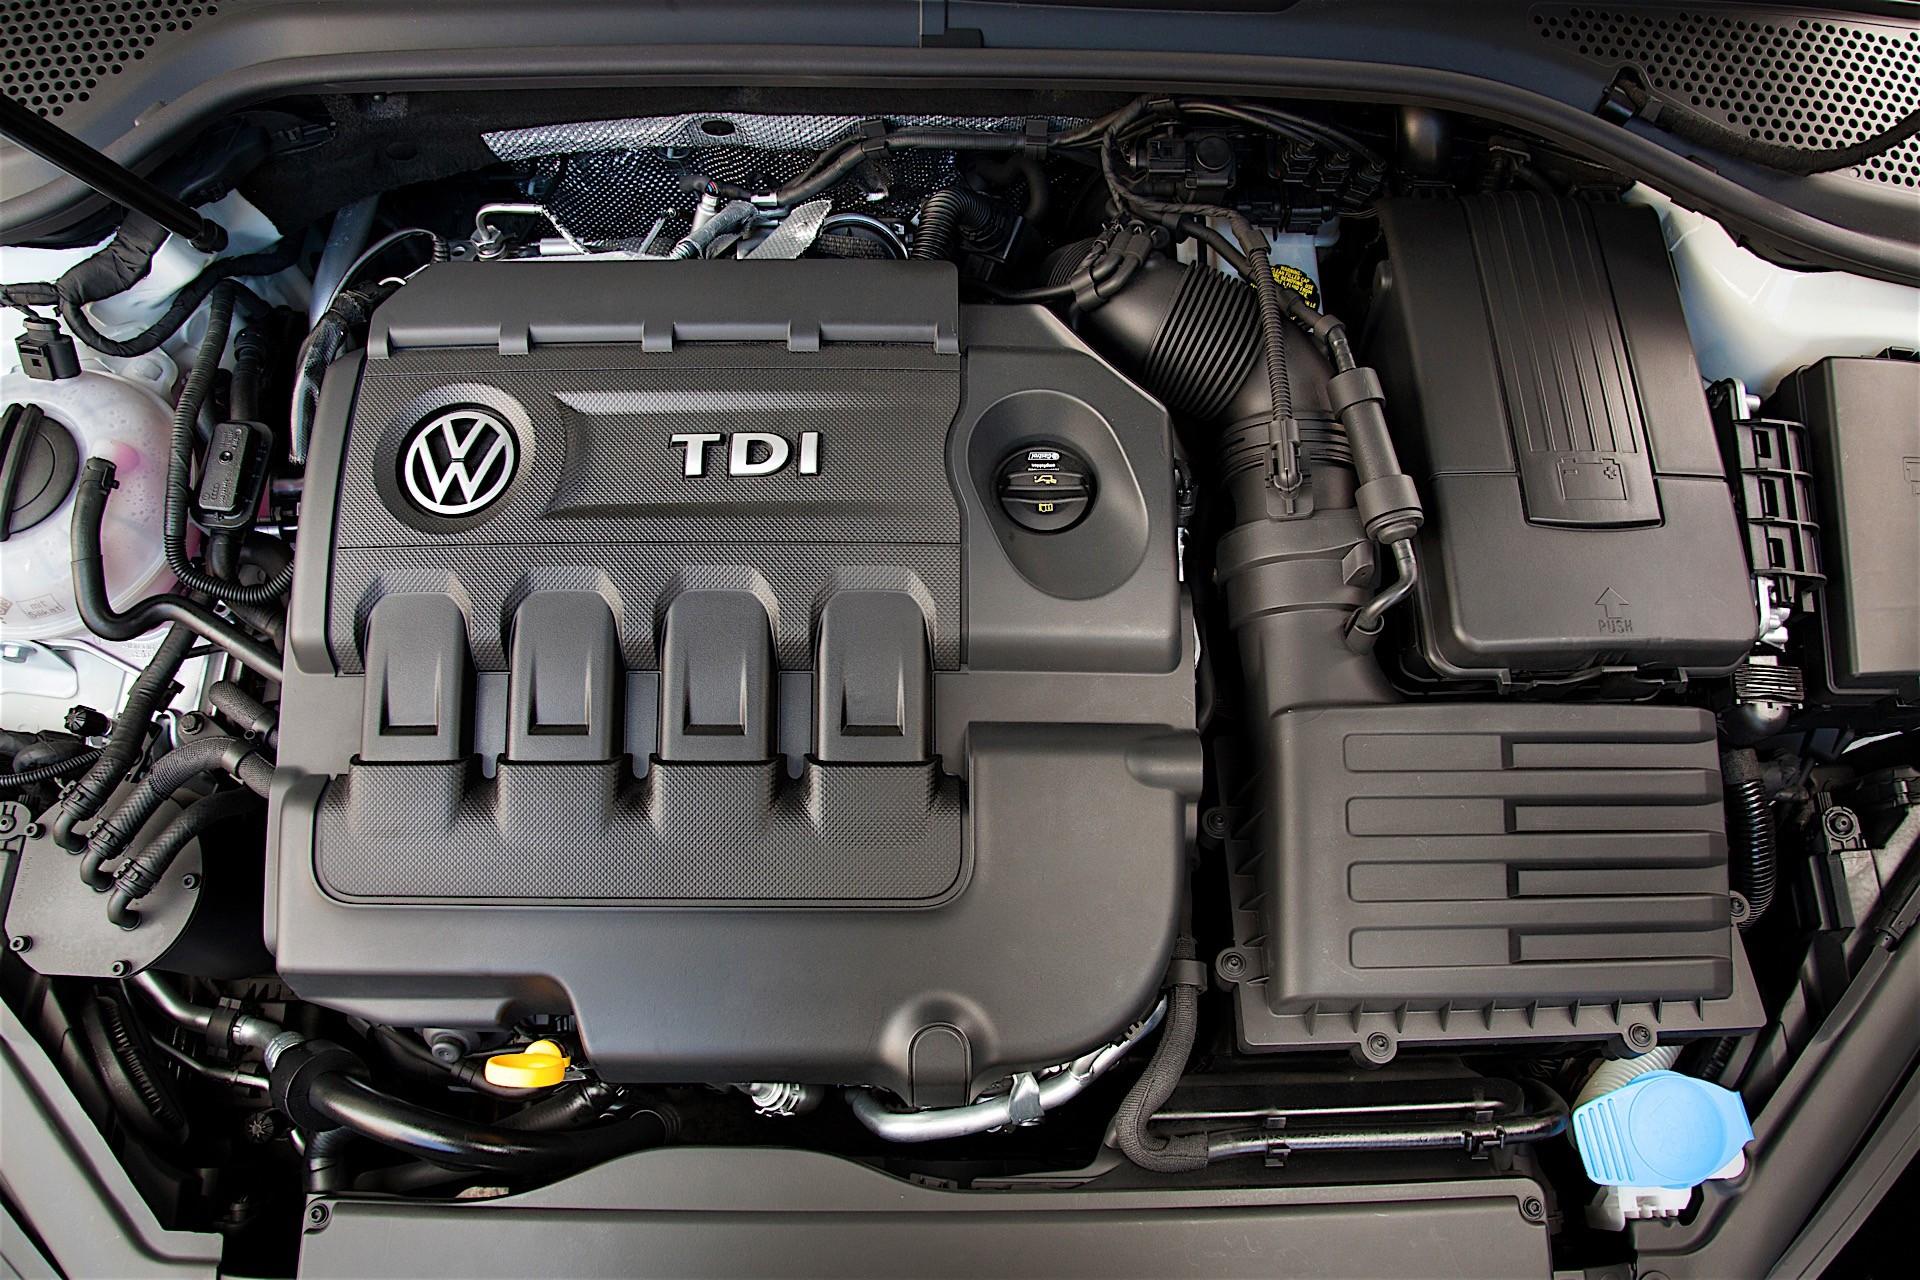 Volkswagen Won t Focus Selling Diesel Engines In USA Anymore